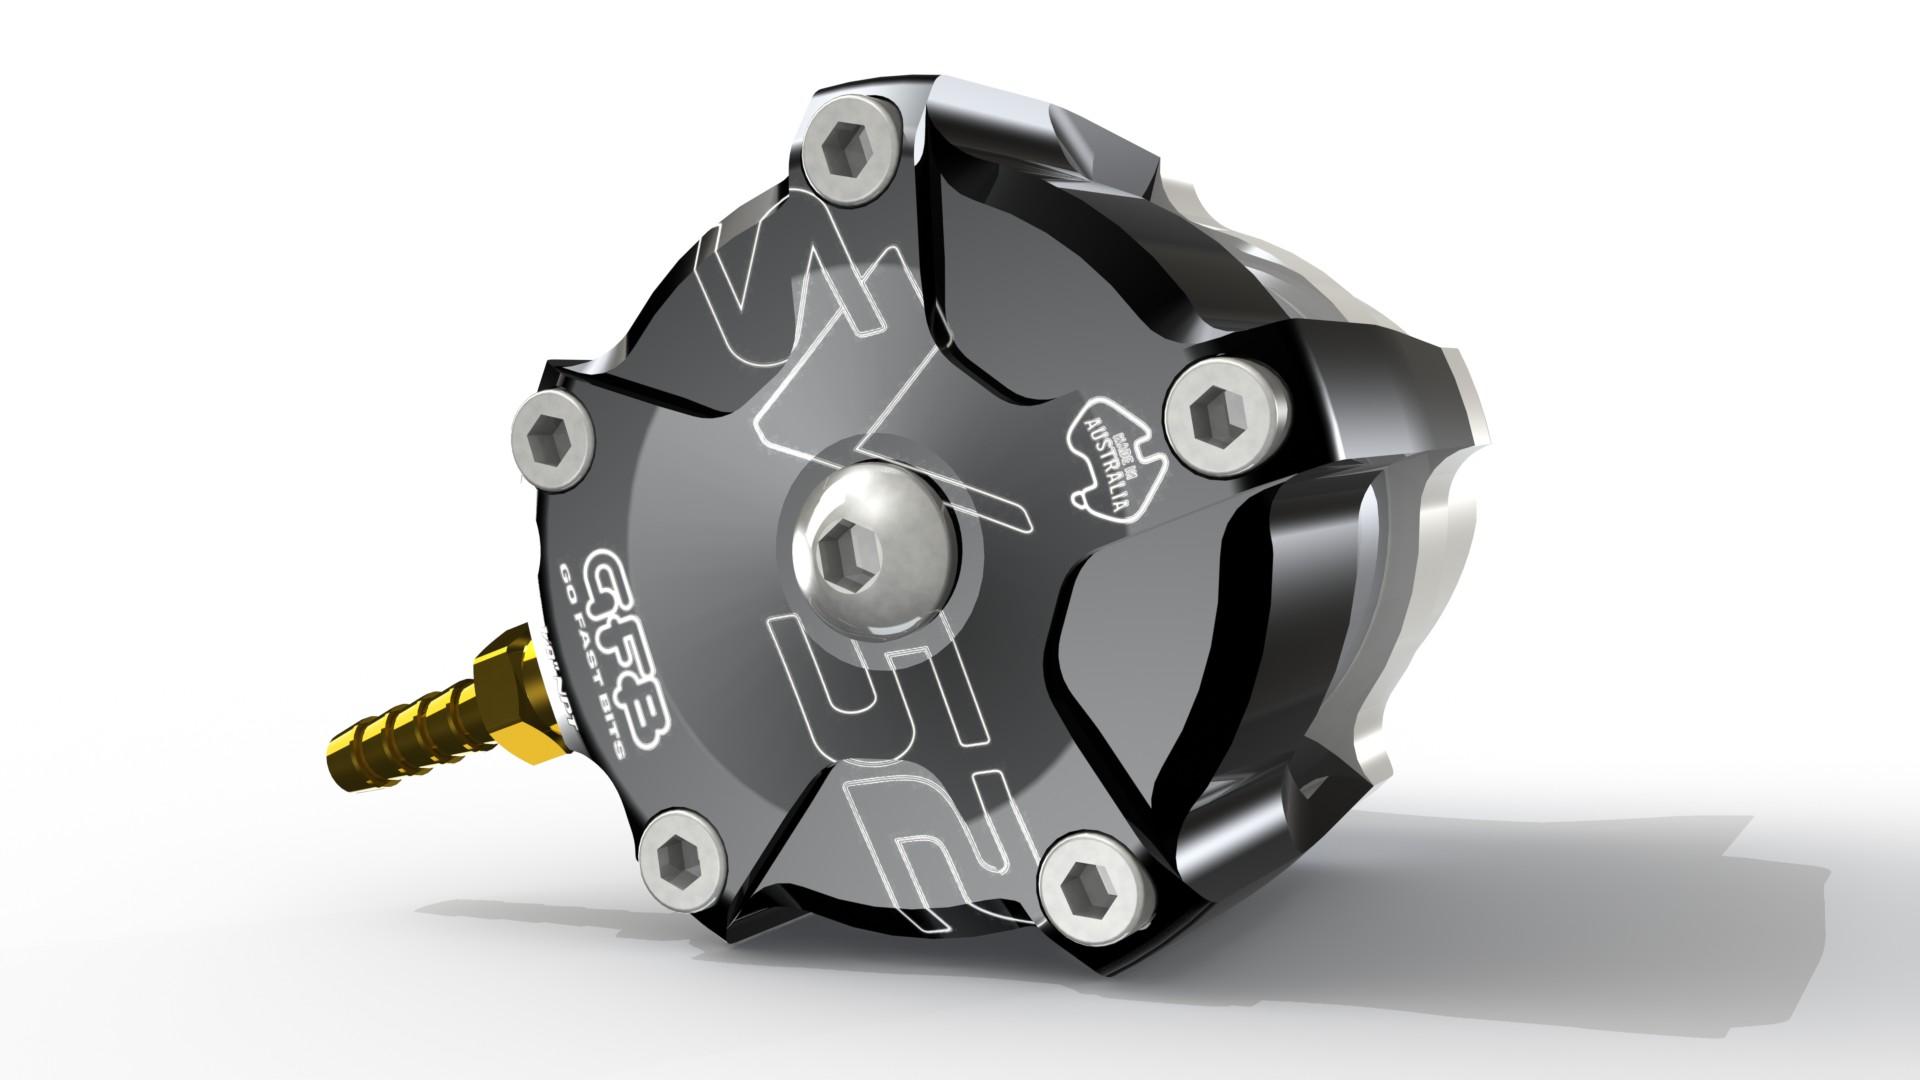 Uniwersalny Zawór Blow Off  SV52 High Performance Racing  [GFB] - GRUBYGARAGE - Sklep Tuningowy